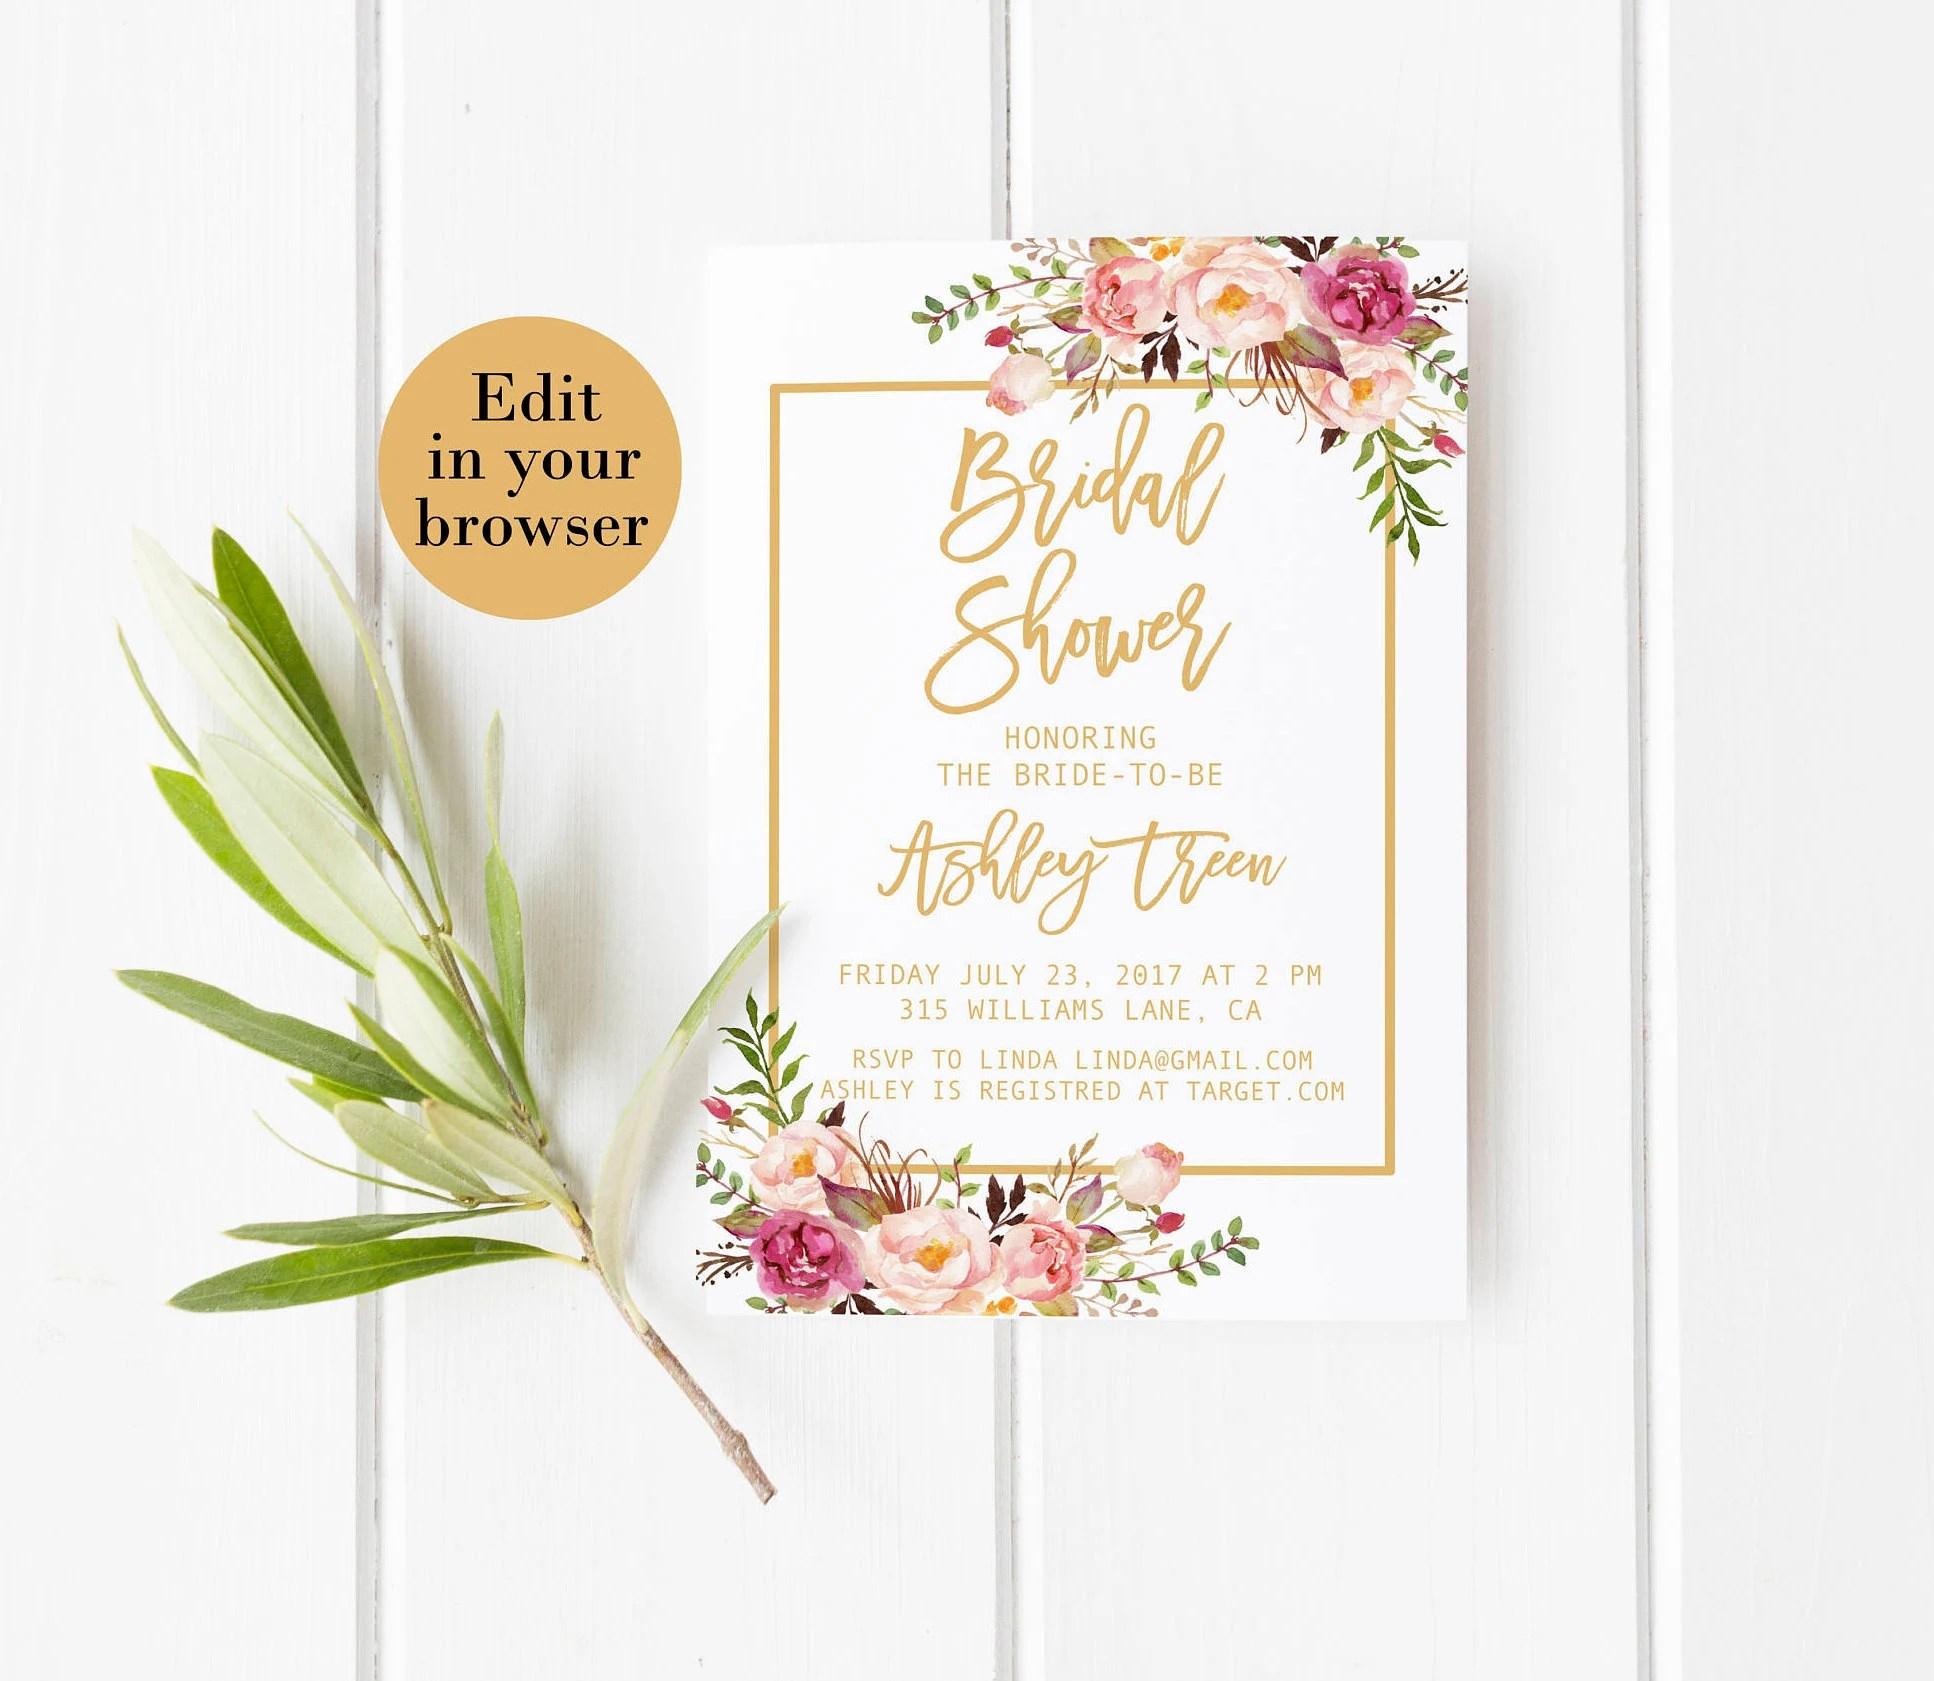 Bridal shower invitation template Editable bridal shower Etsy